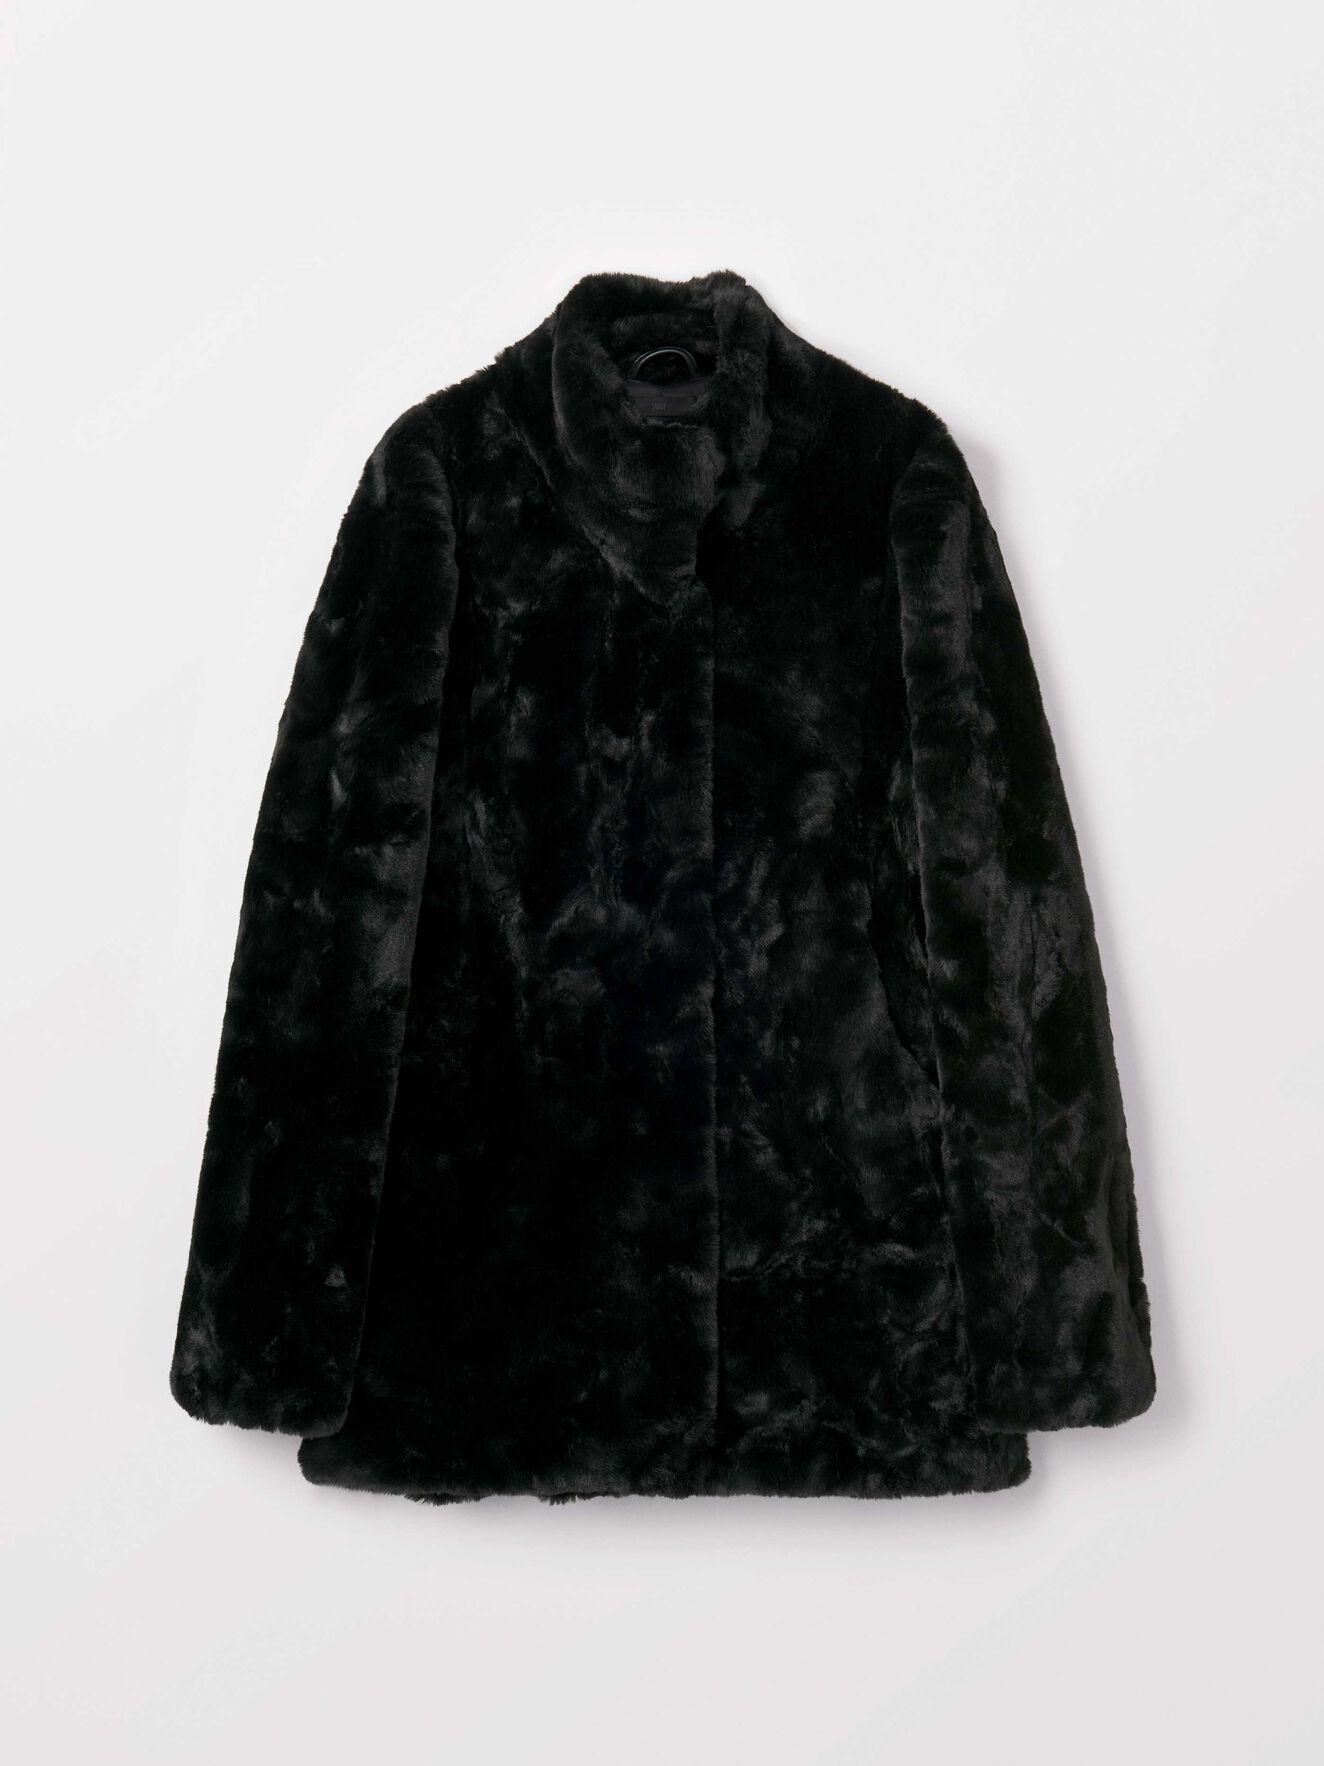 Minimal Coat in Black from Tiger of Sweden